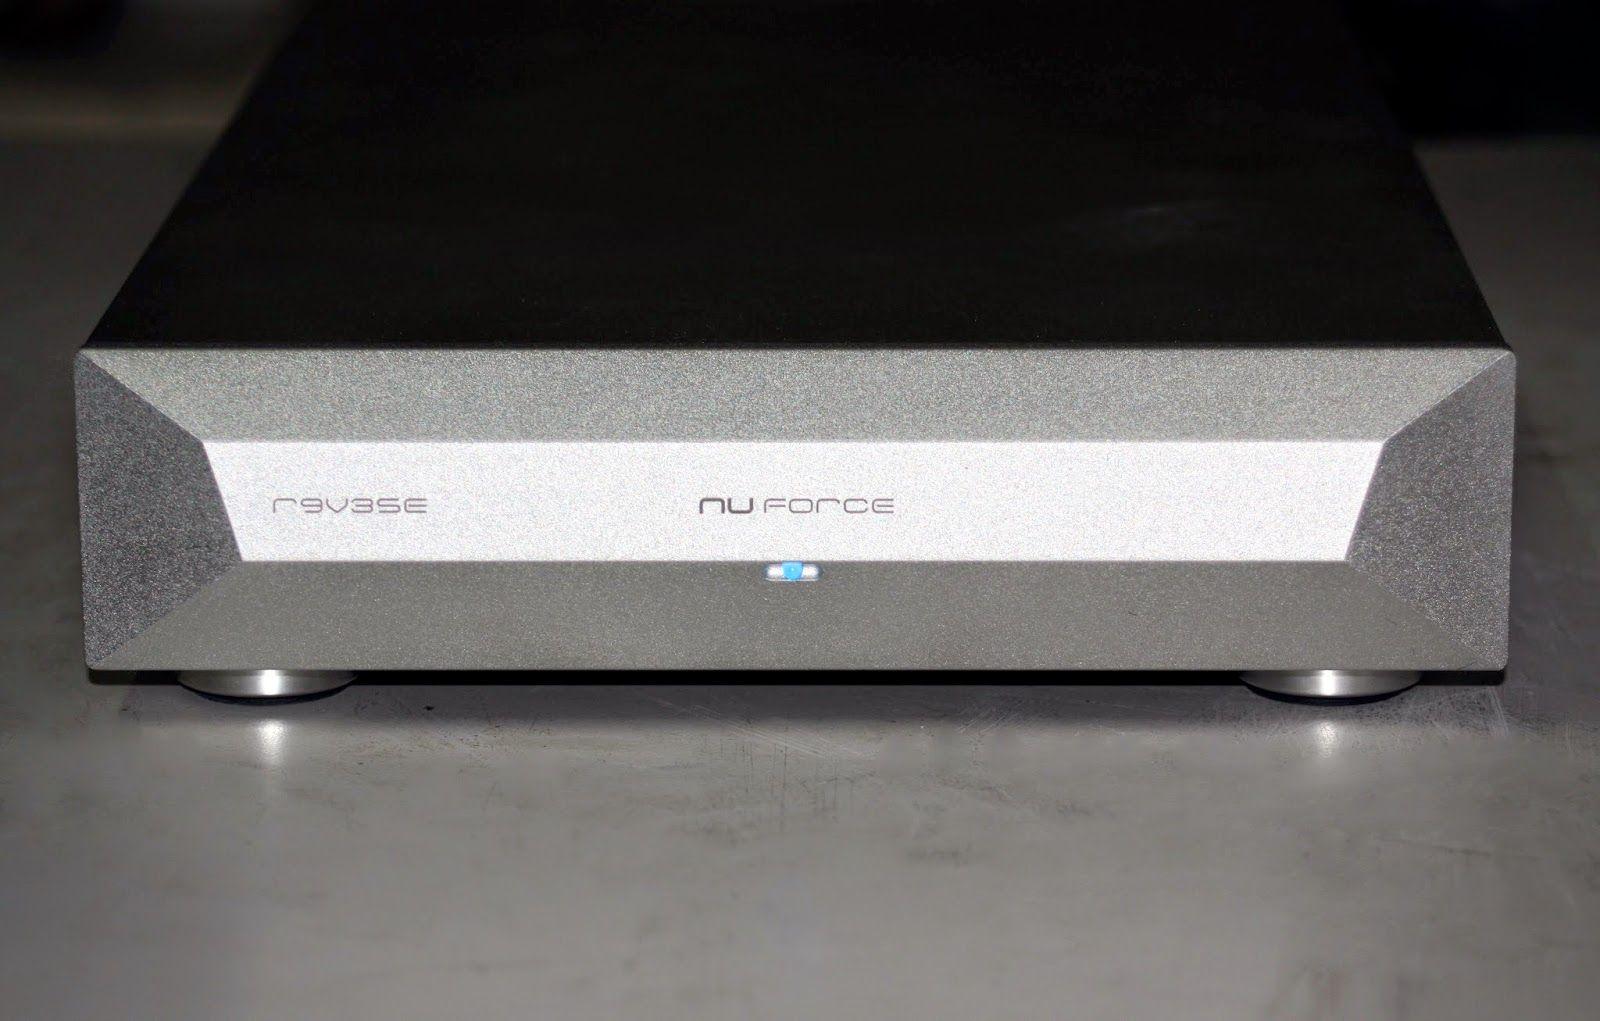 吉鵬音響工作坊: [維修] NuForce Ref 9 V3SE   Bose